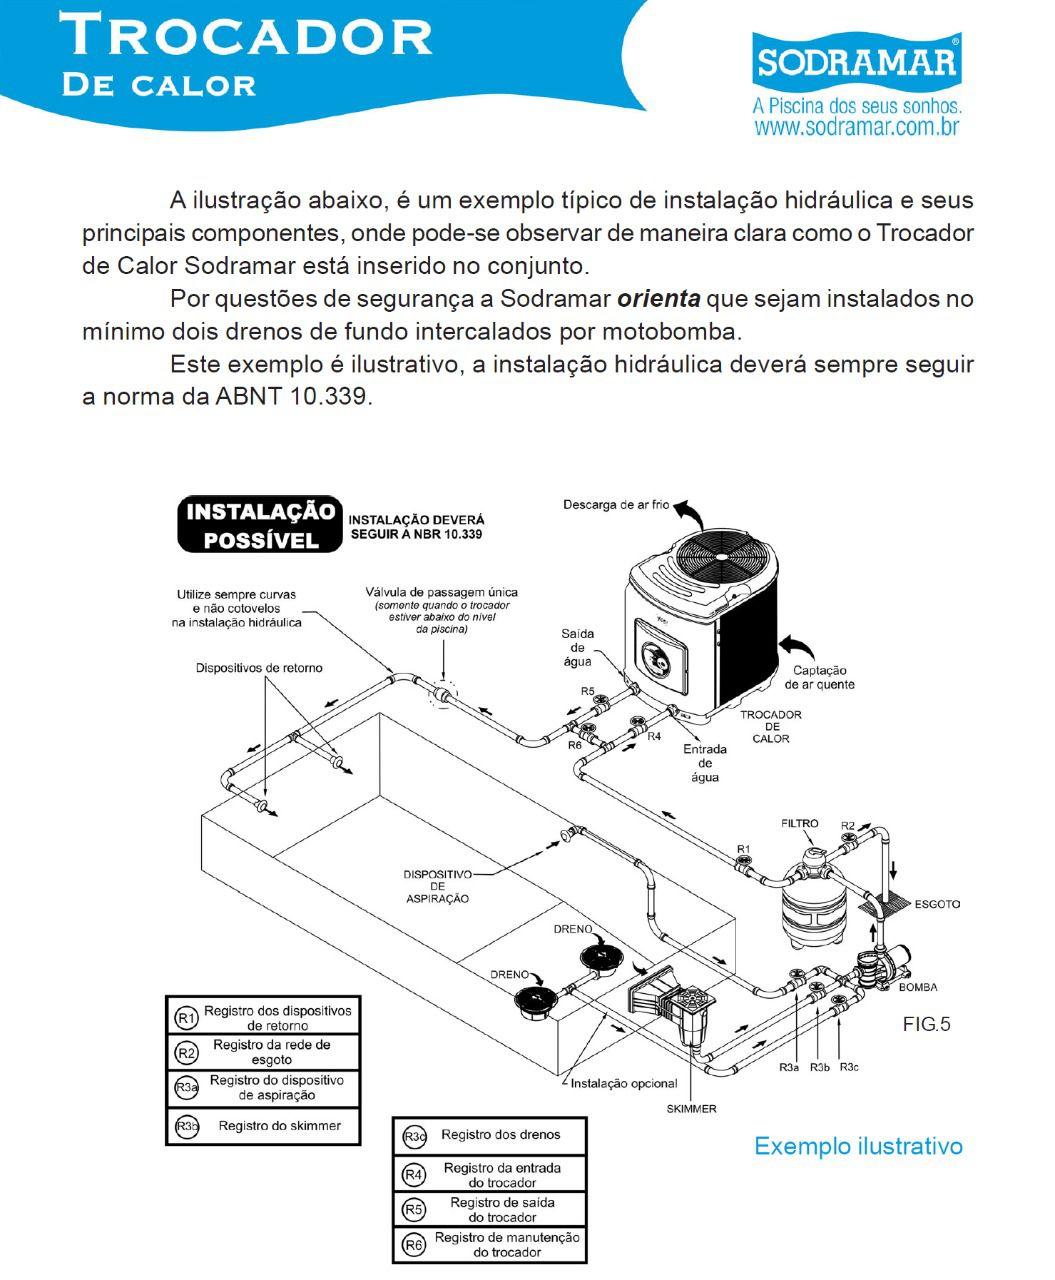 Aquecedor de piscina Yes - Trocador de Calor SD-60 Trif 380V